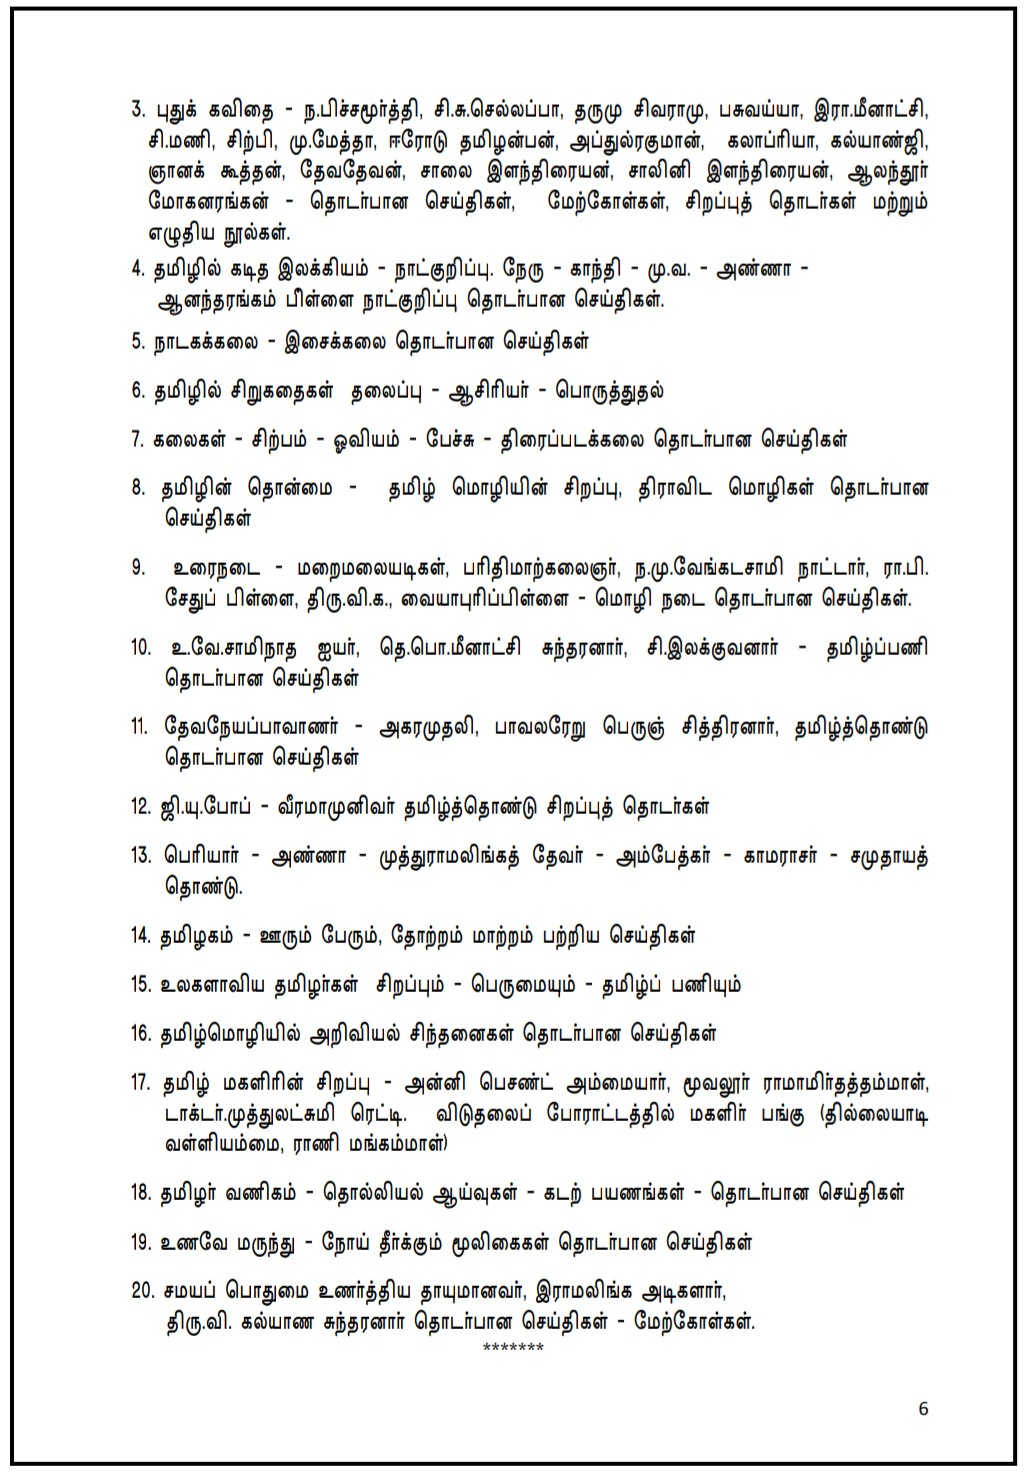 TNPSC Group 4 Syllabus | தமிழ்நாடு பொது சேவை ஆணையம் TNPSC குரூப் 4 -பாடத்திட்டம் |_90.1